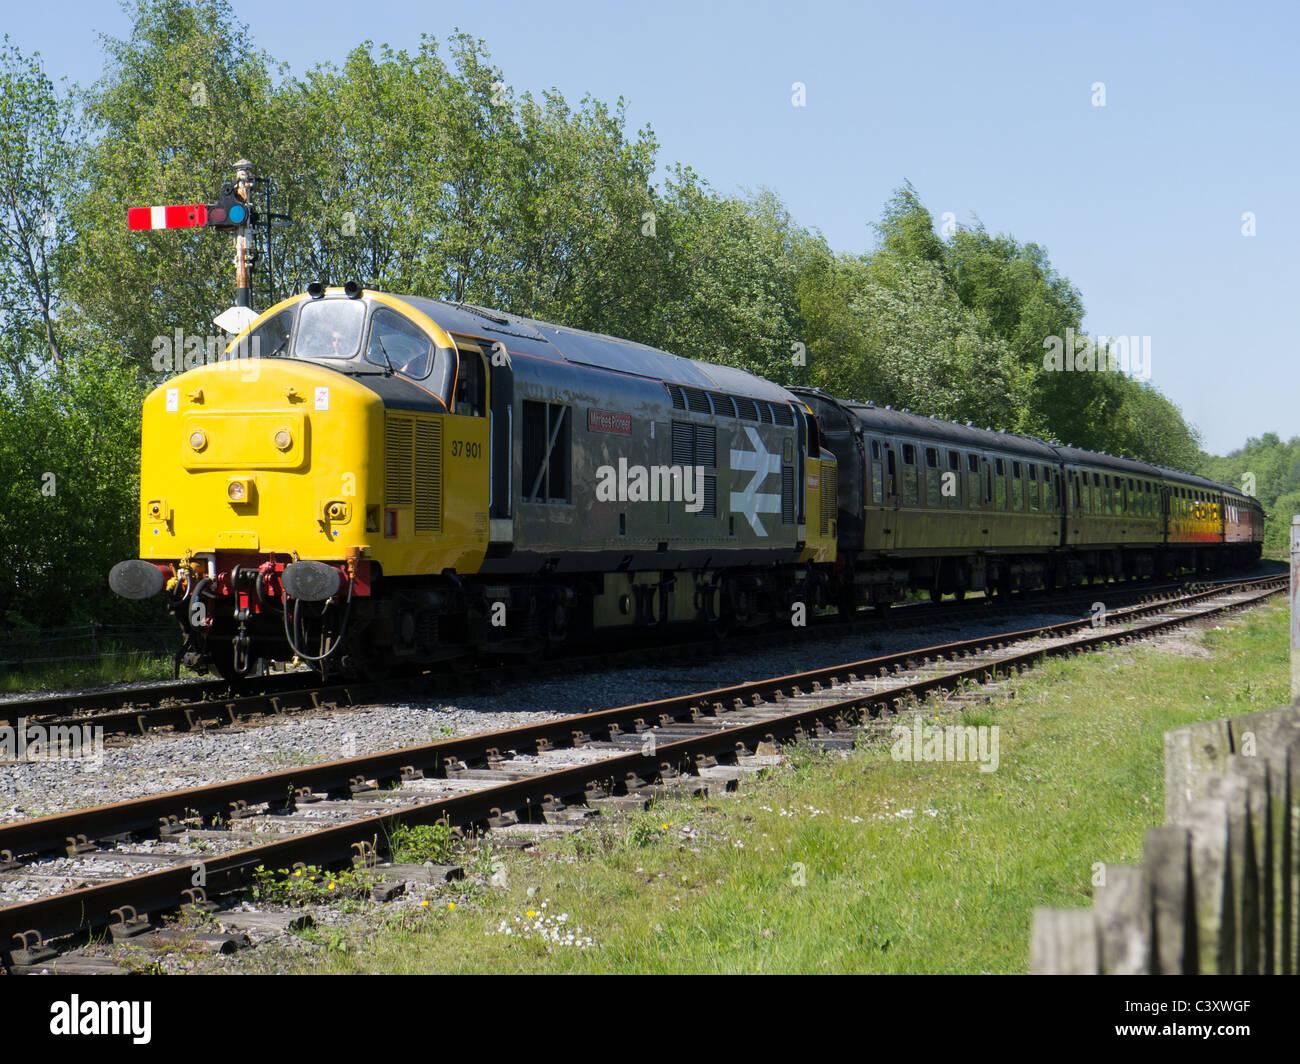 Diesel train on East Lancs Railway, Ramsbottom - Stock Image